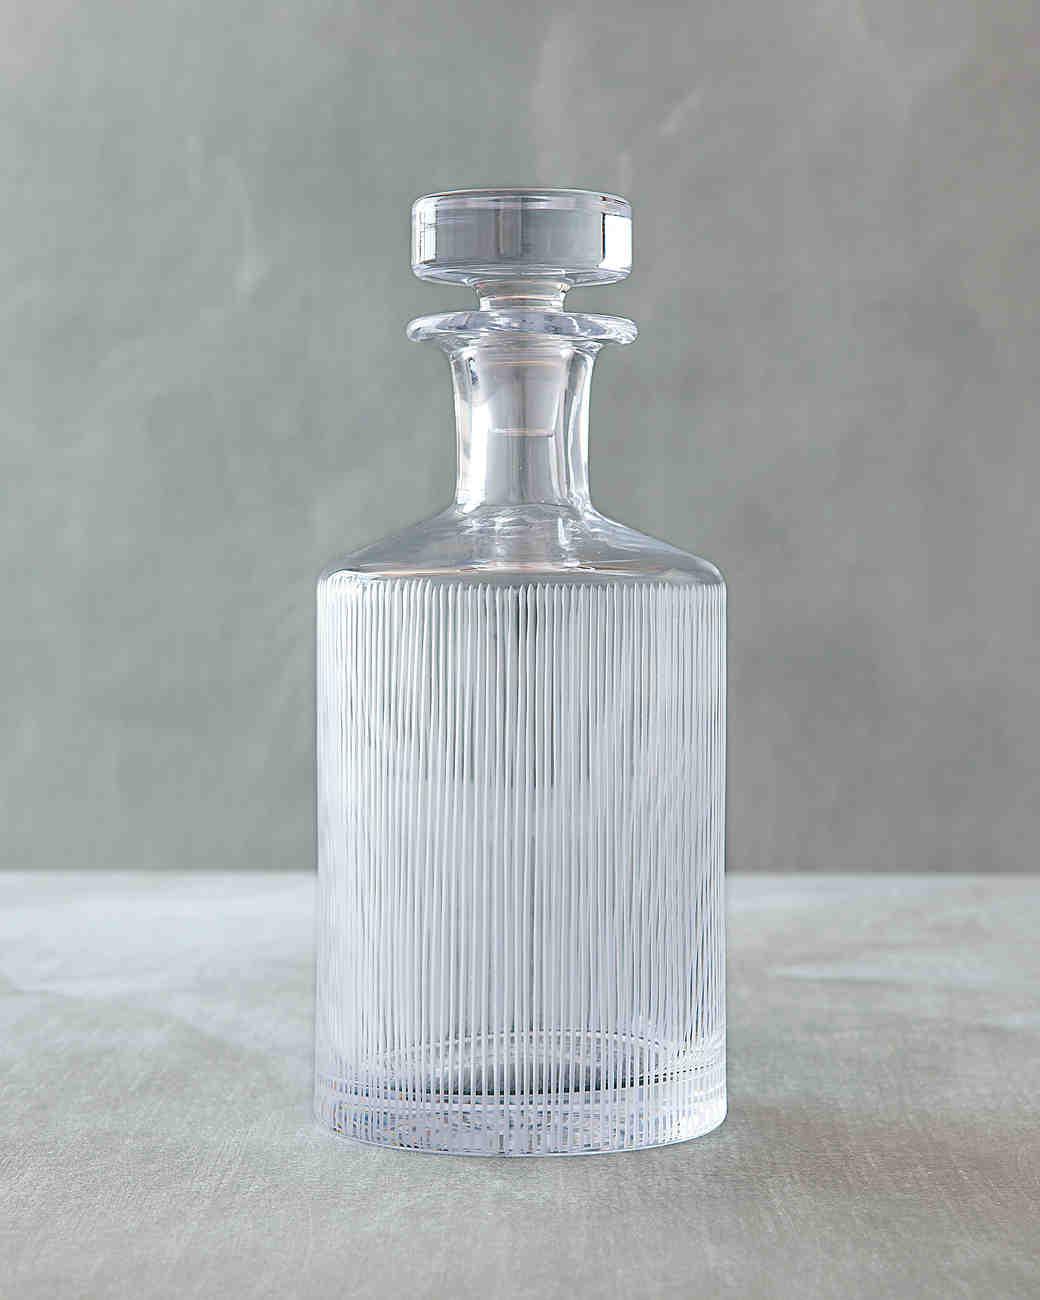 crystal-decanter-0811mwd107434.jpg